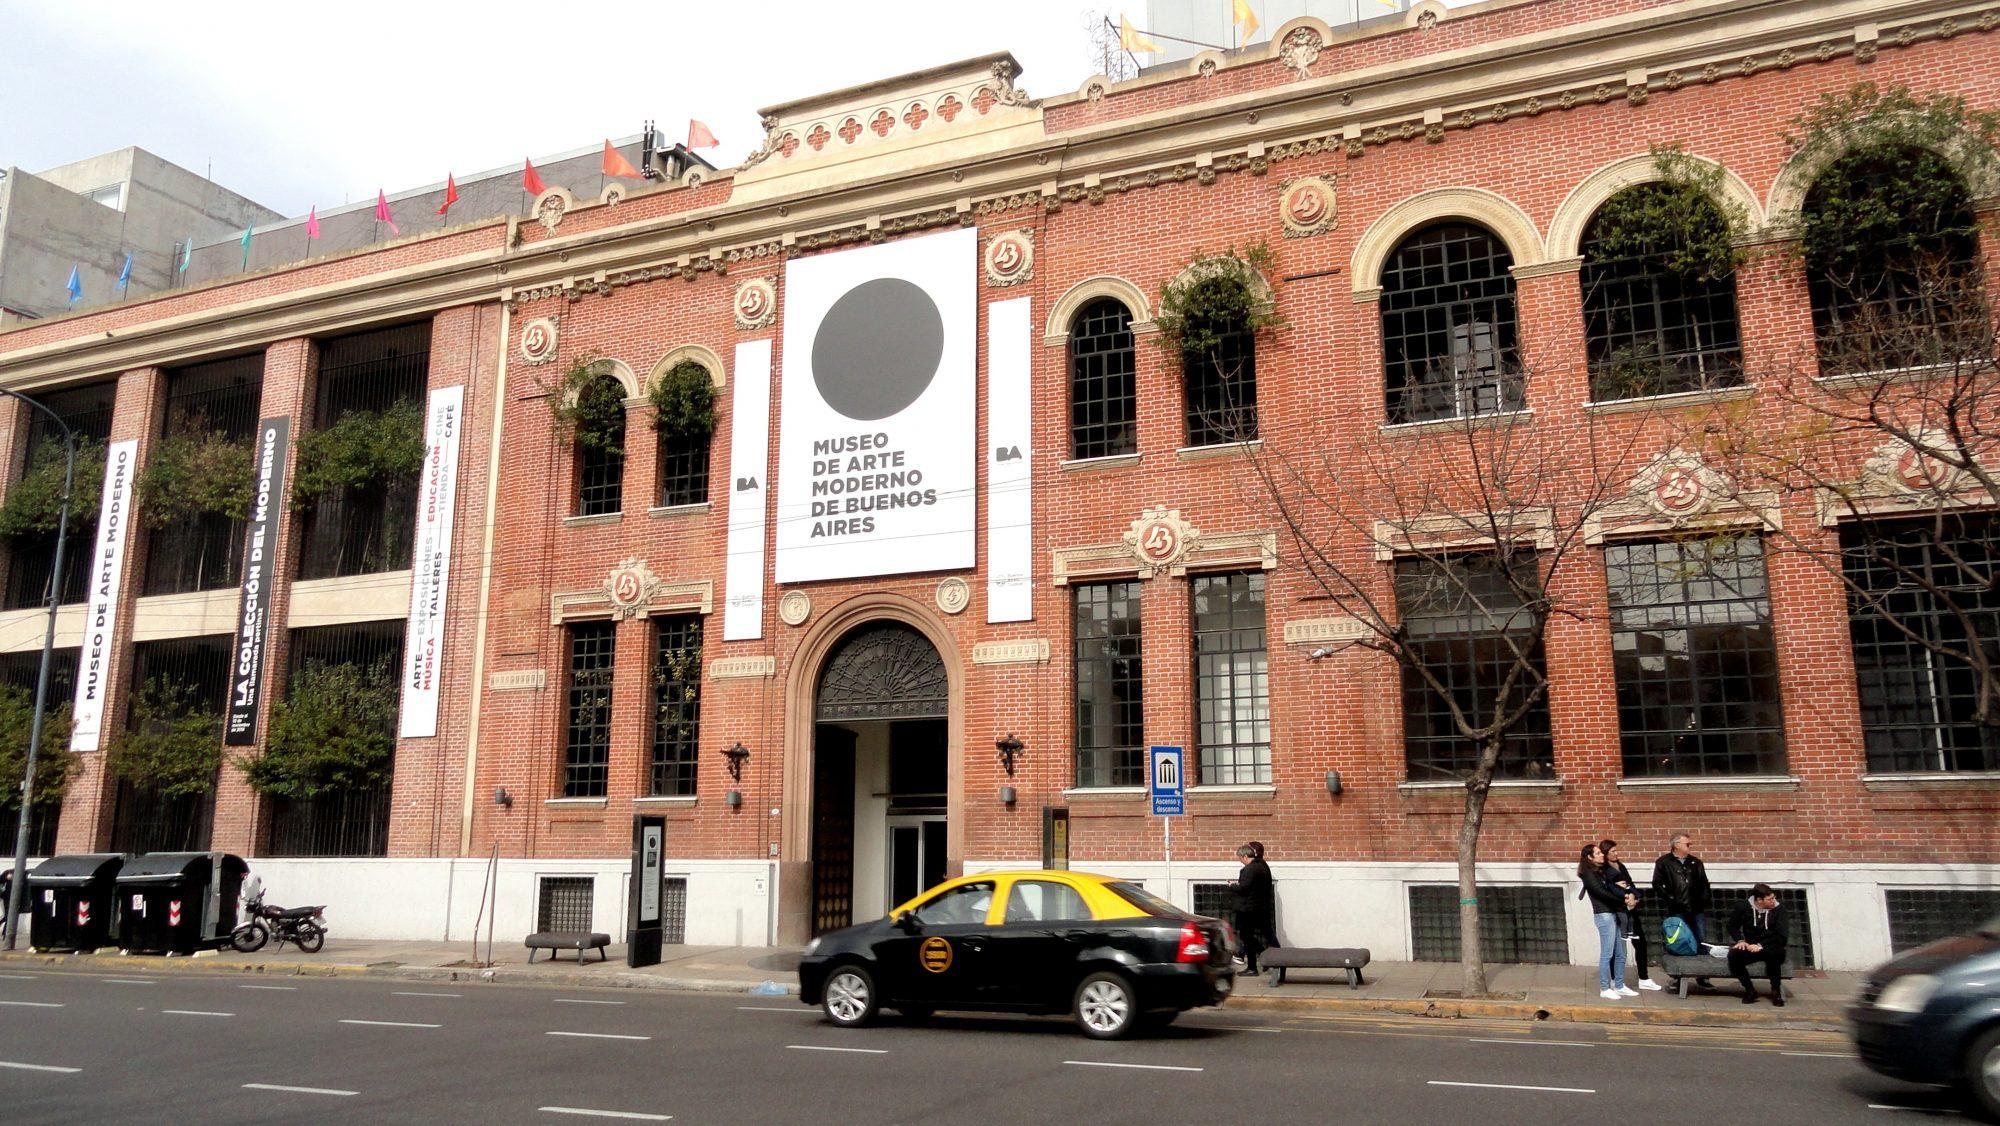 Argentina_Nobleza_Picardo_Patrimônio_Arquitetura_Polo Cultural Sur_Cultura_San Telmo_Ambasz_Casa del Naranjo